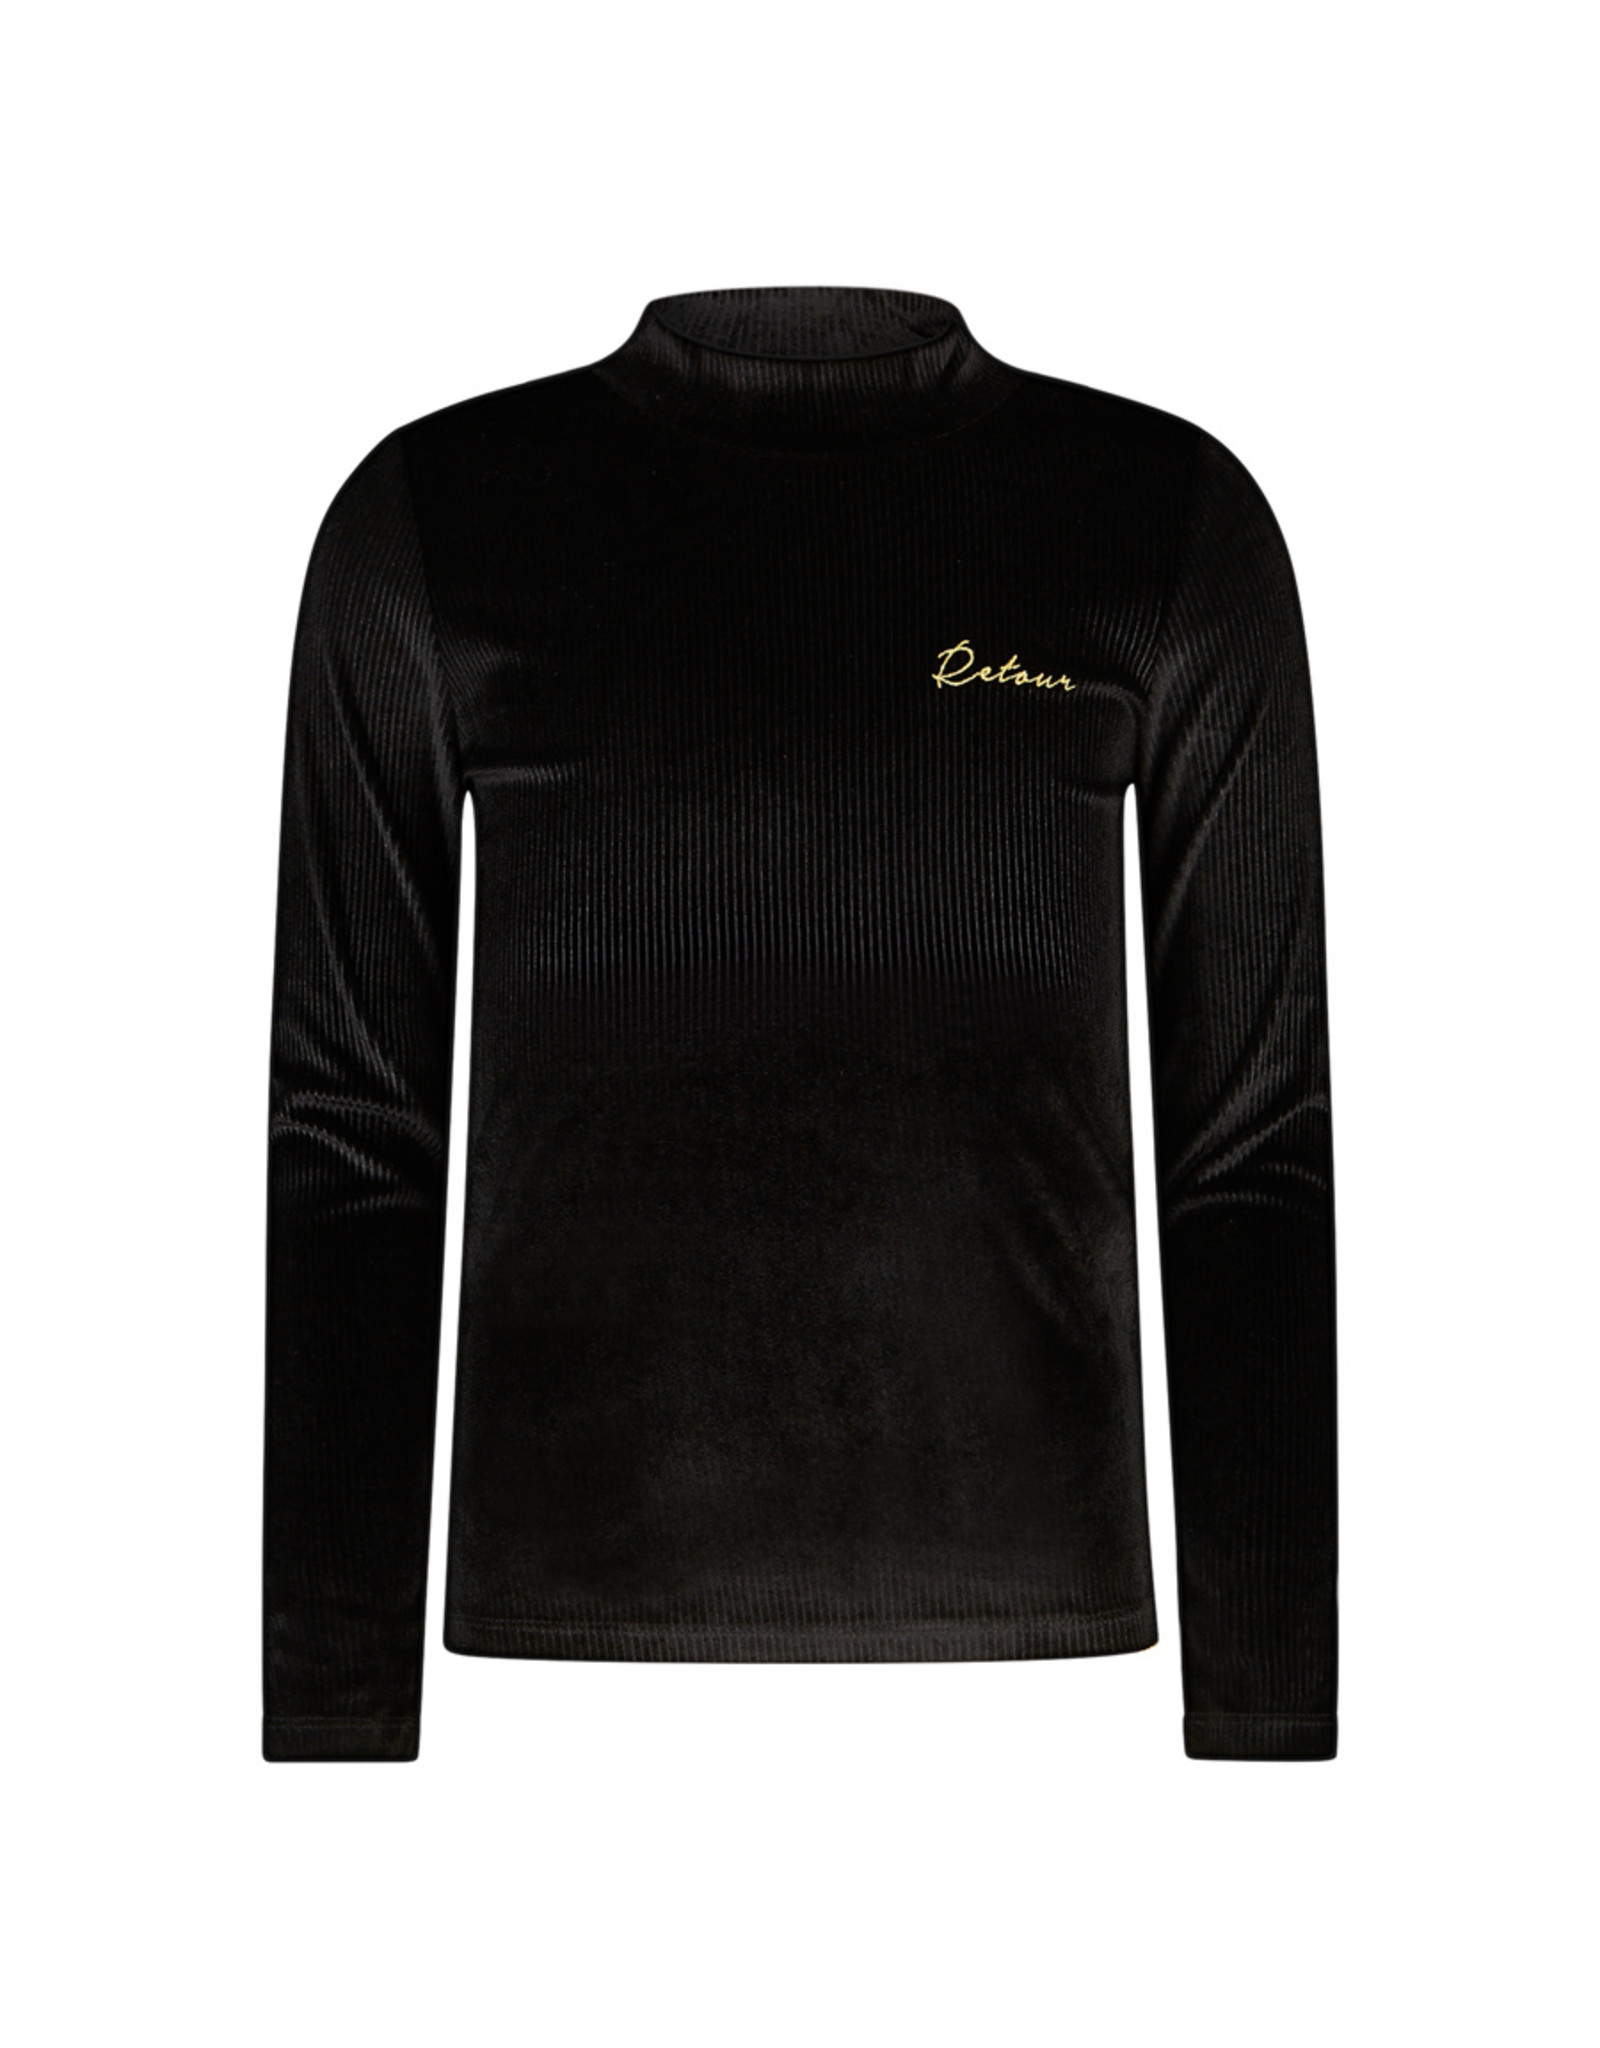 Retour Jeans Girls Geertruide T-Shirts Black